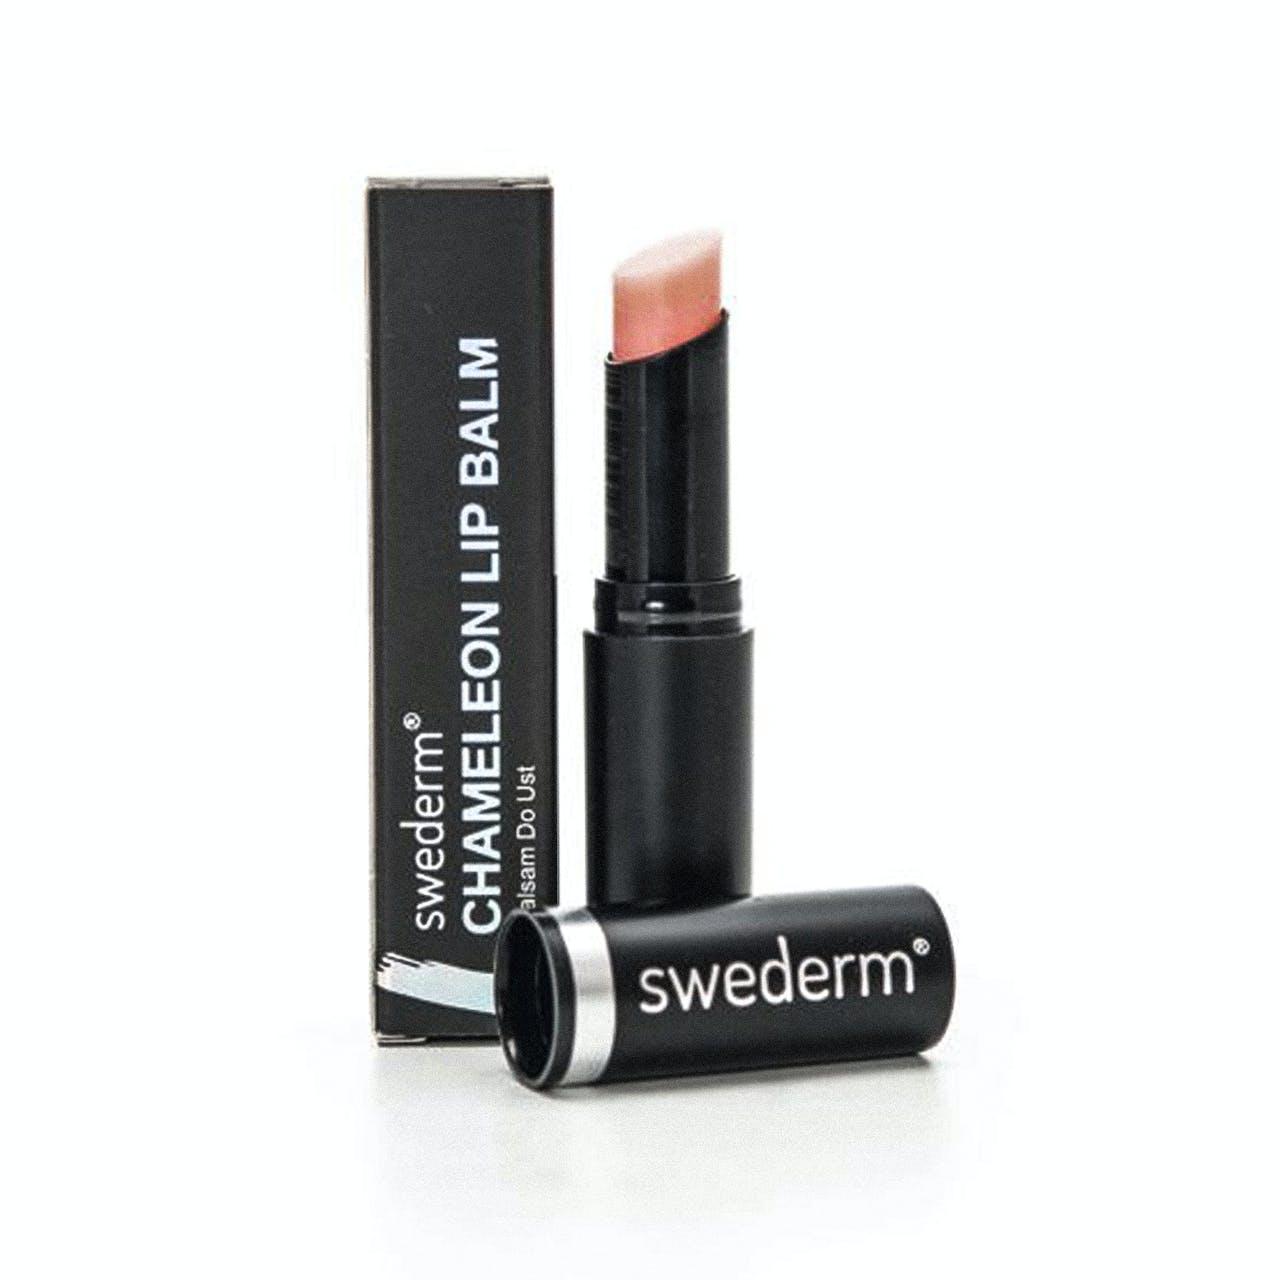 Swederm – Lippenbalsam – Chameleon Lip Balm